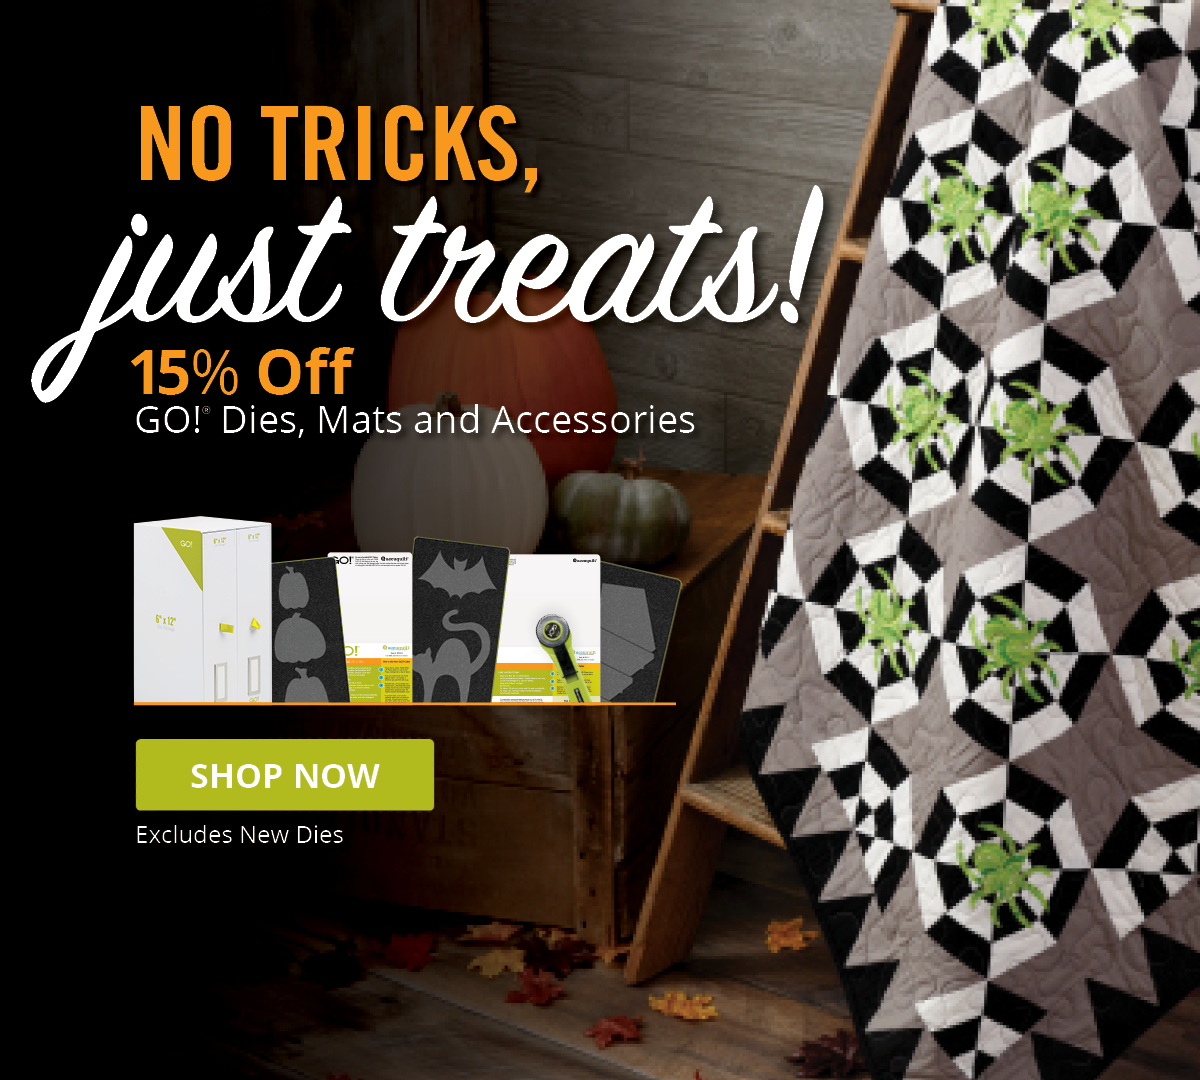 No Tricks, Just Treats! | Get 15% Off GO! Dies, Mats and Accessories >